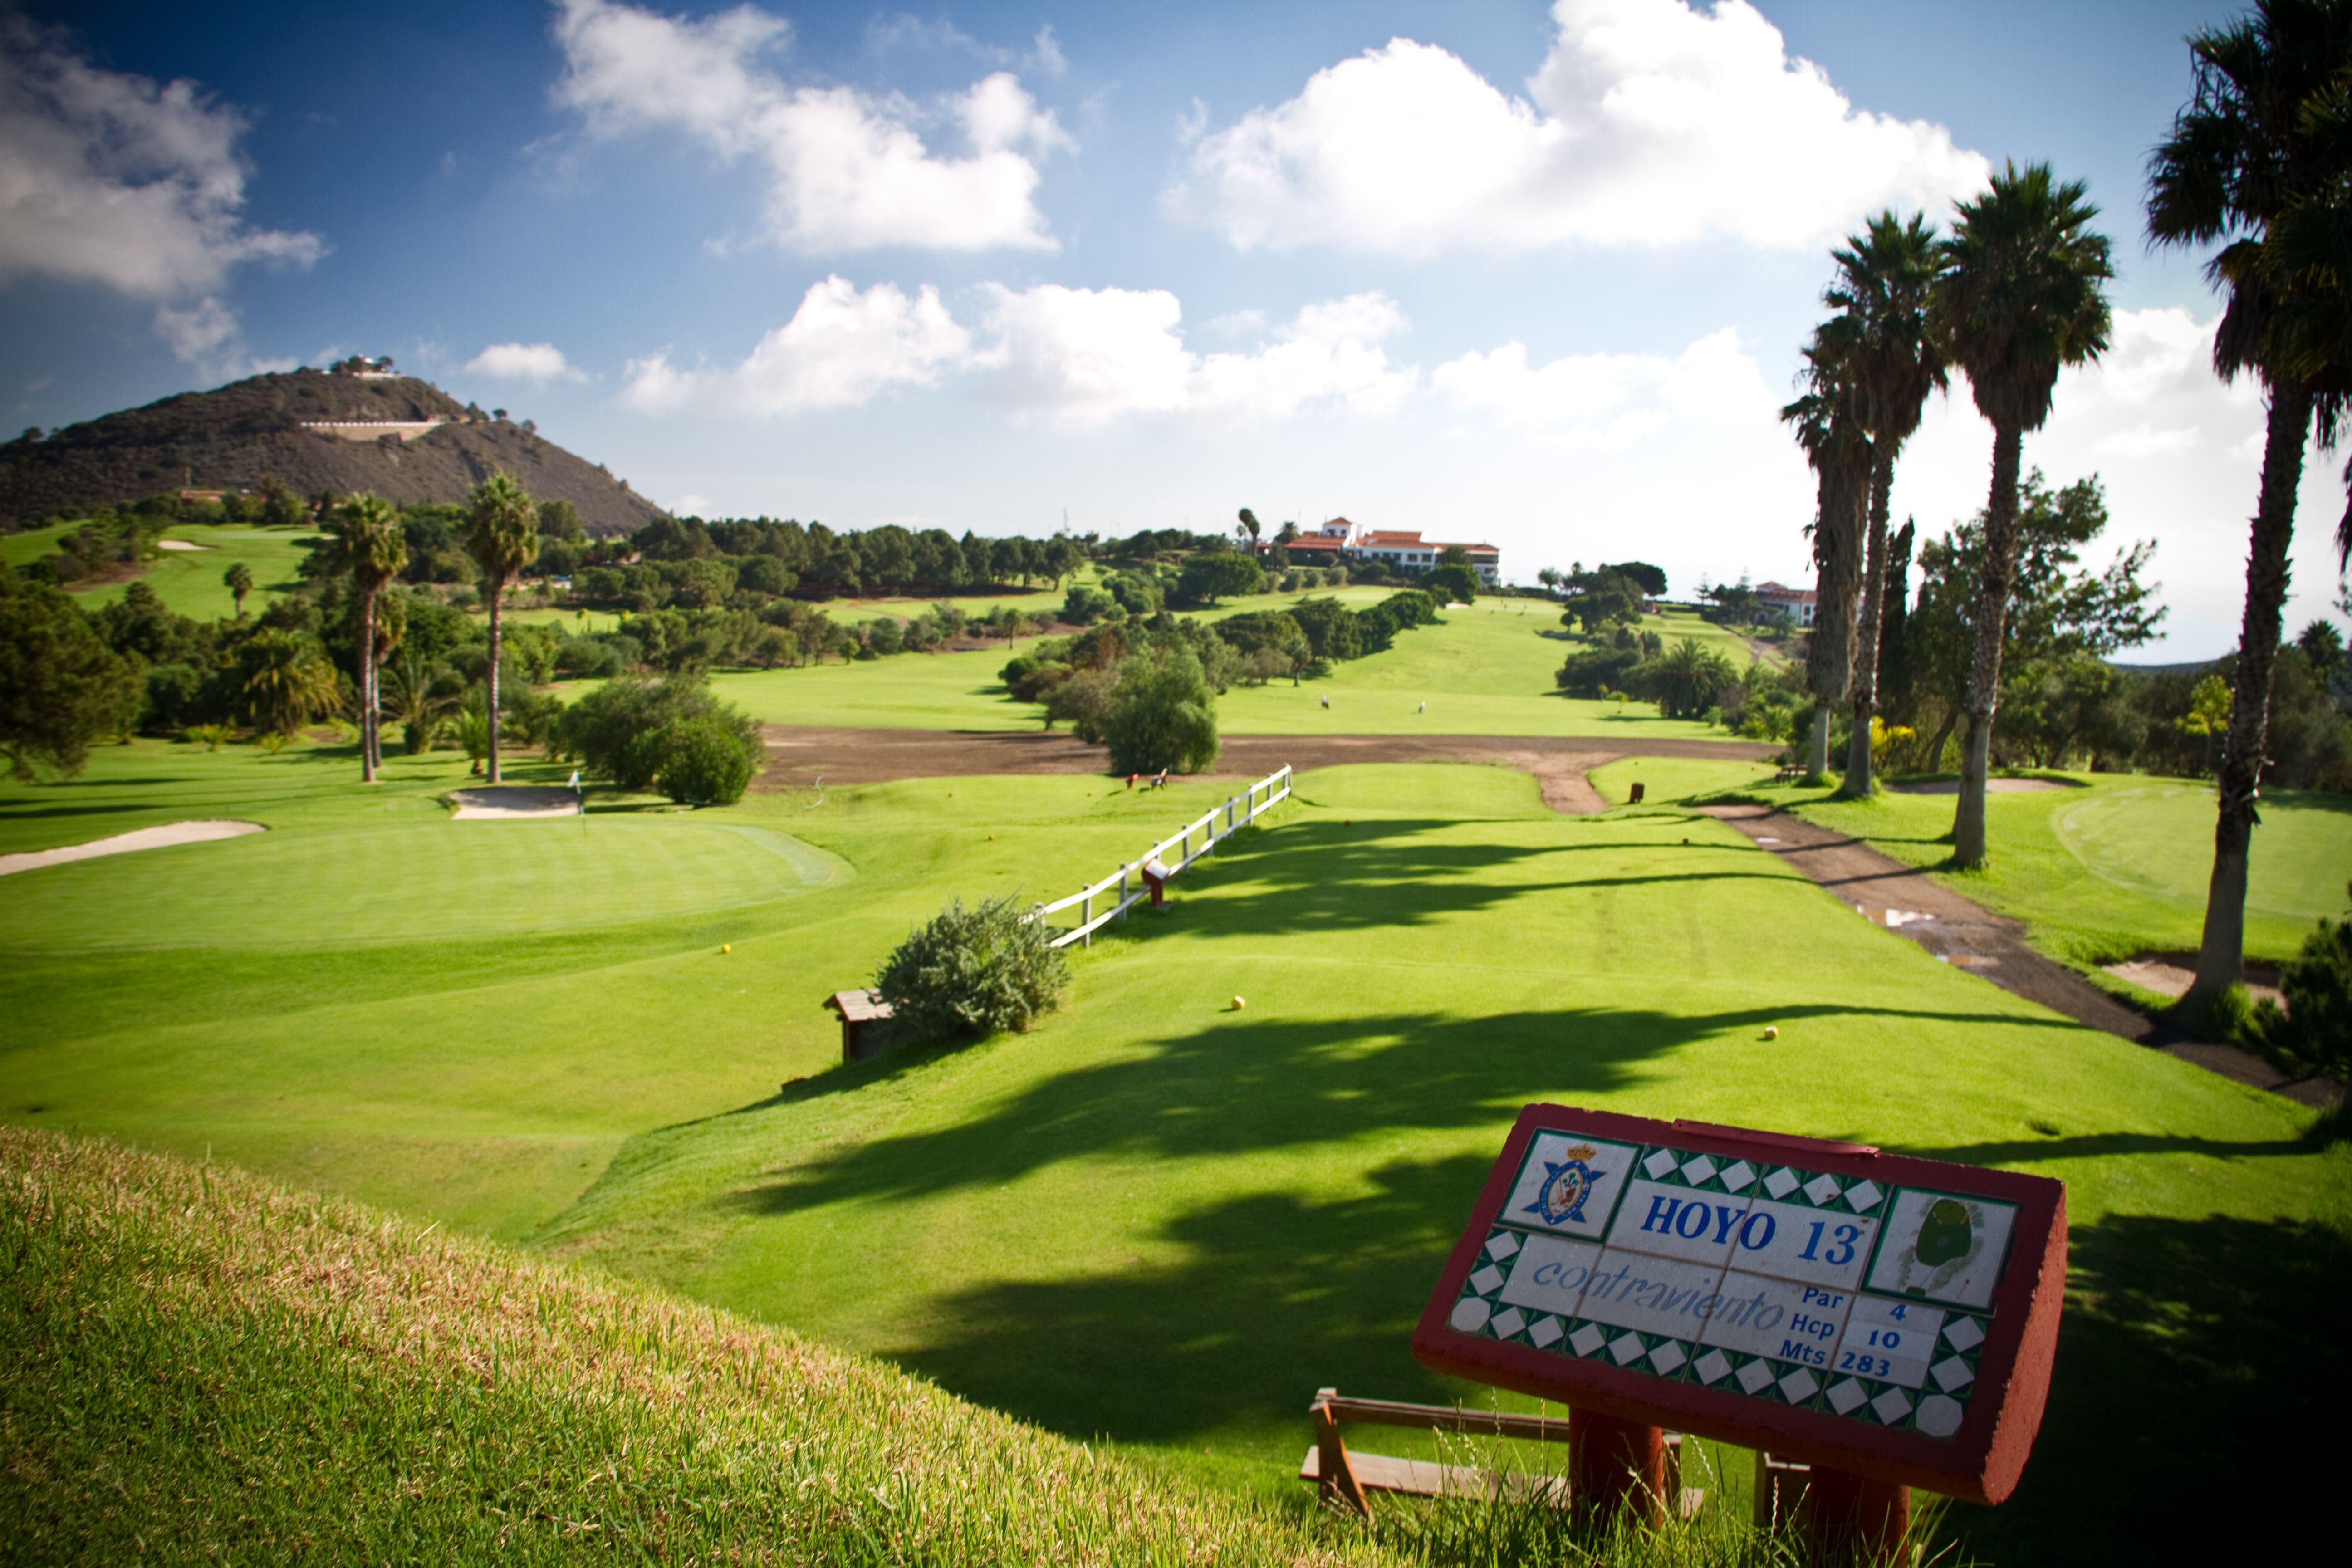 Golfbana på Bandama Golf Hotell, Santa Brigida Gran Canaria